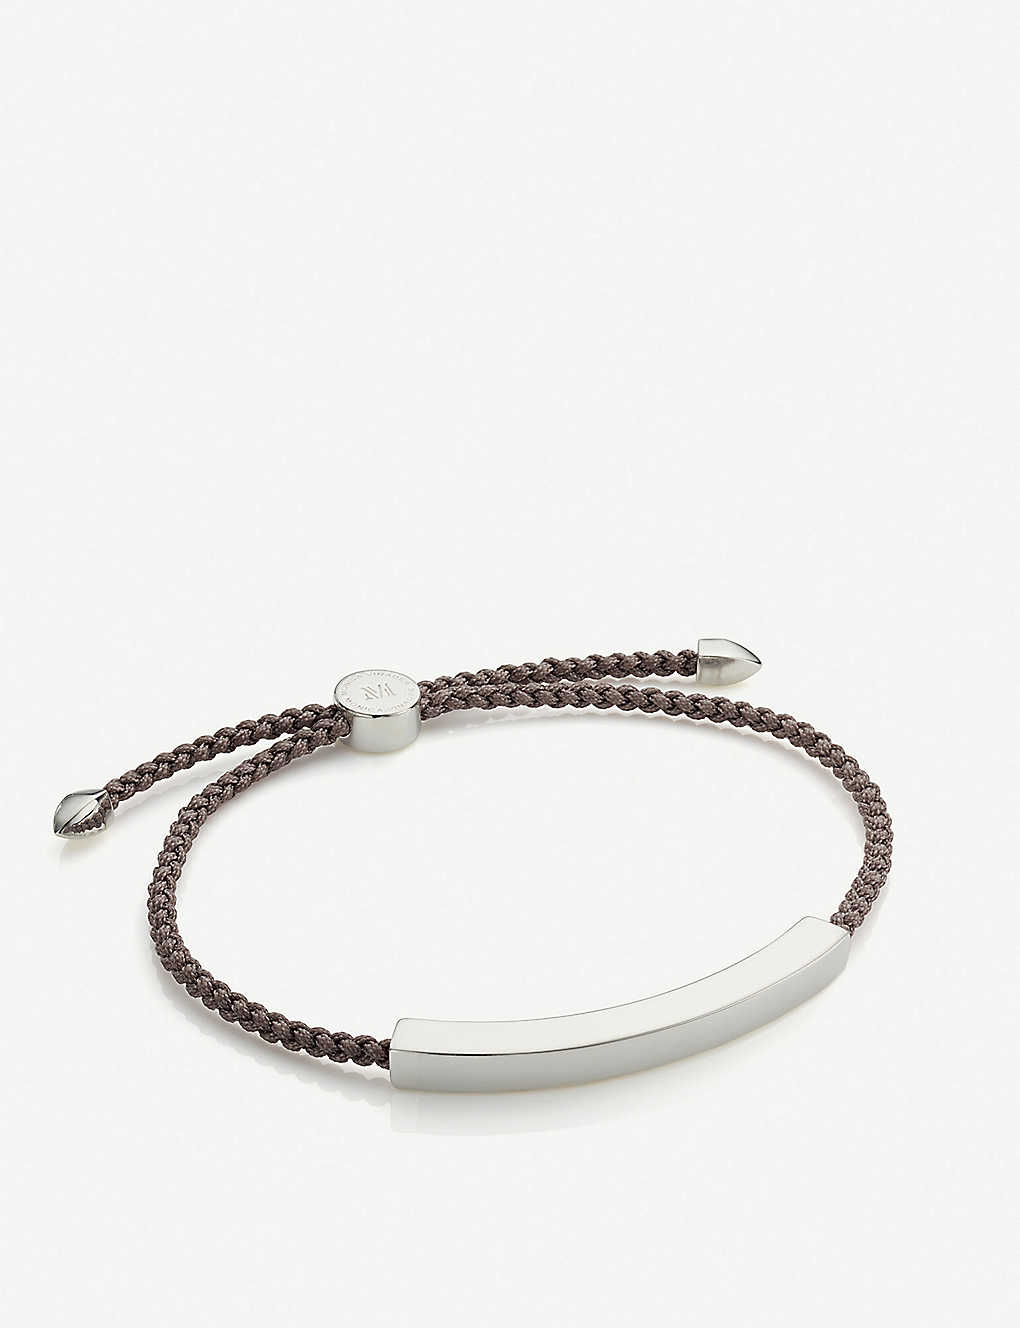 170ae6d84 MONICA VINADER - Linear sterling silver friendship bracelet ...